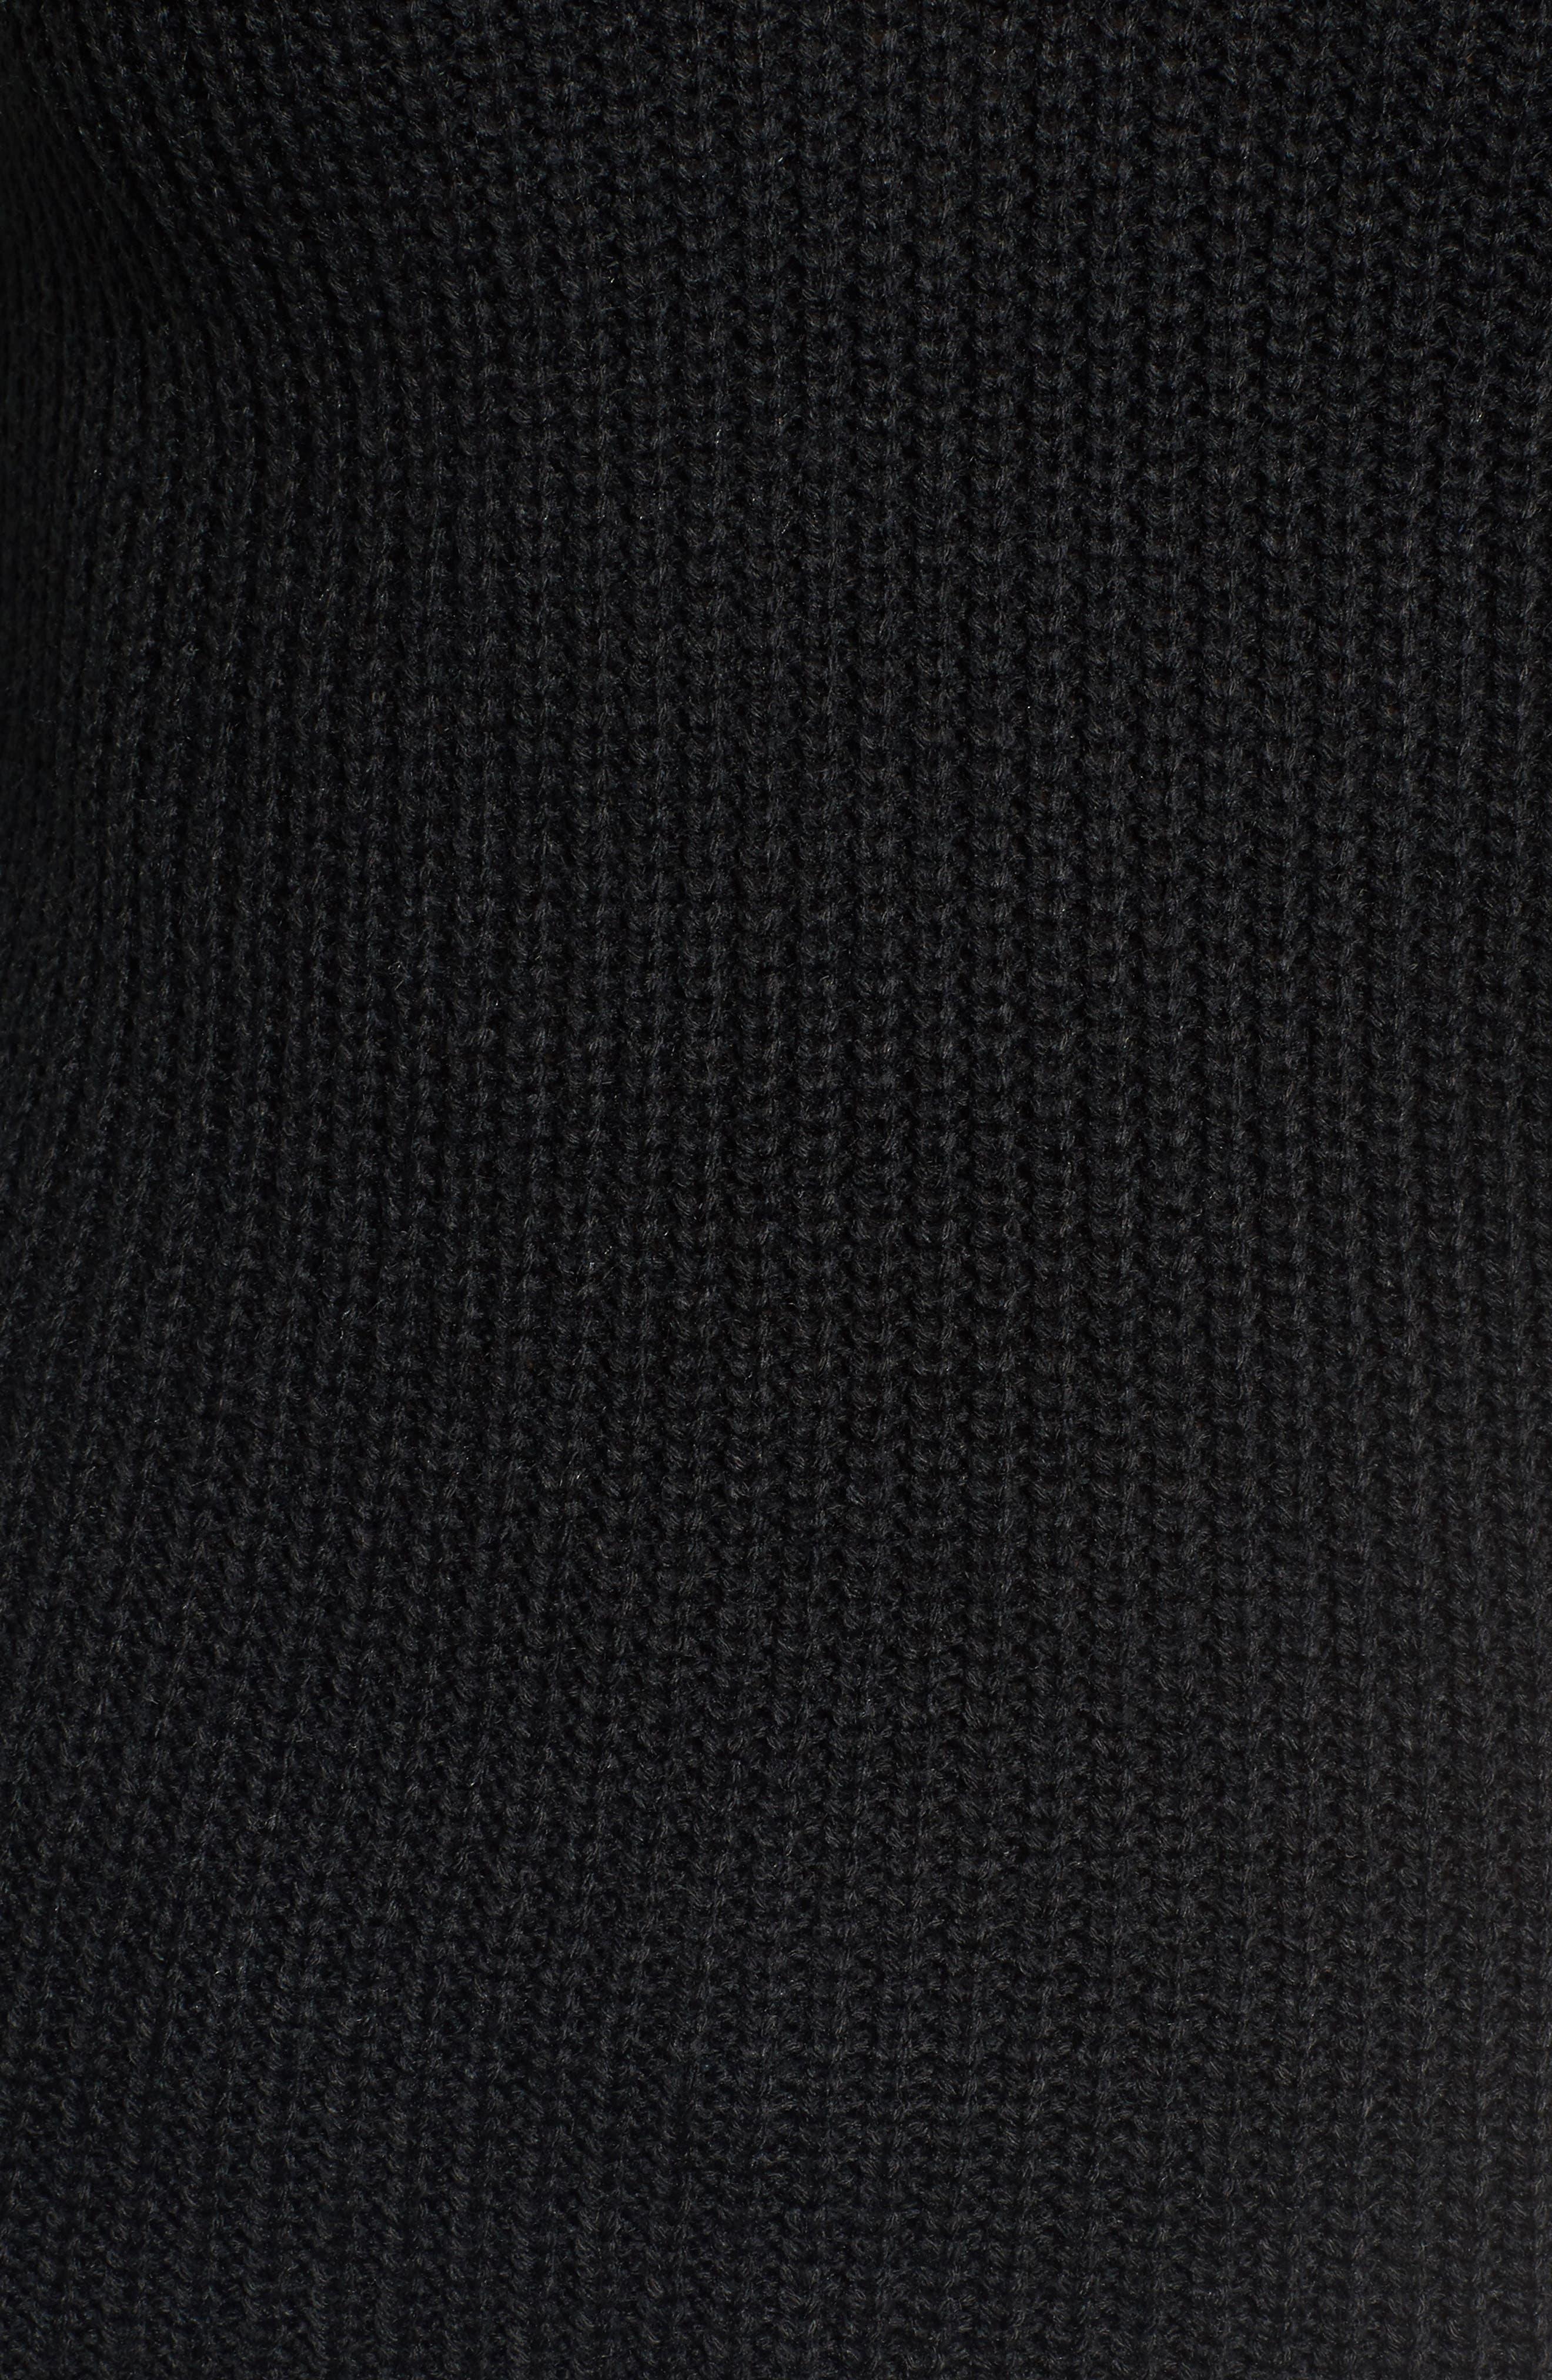 Madison Cutout Sweater,                             Alternate thumbnail 5, color,                             001